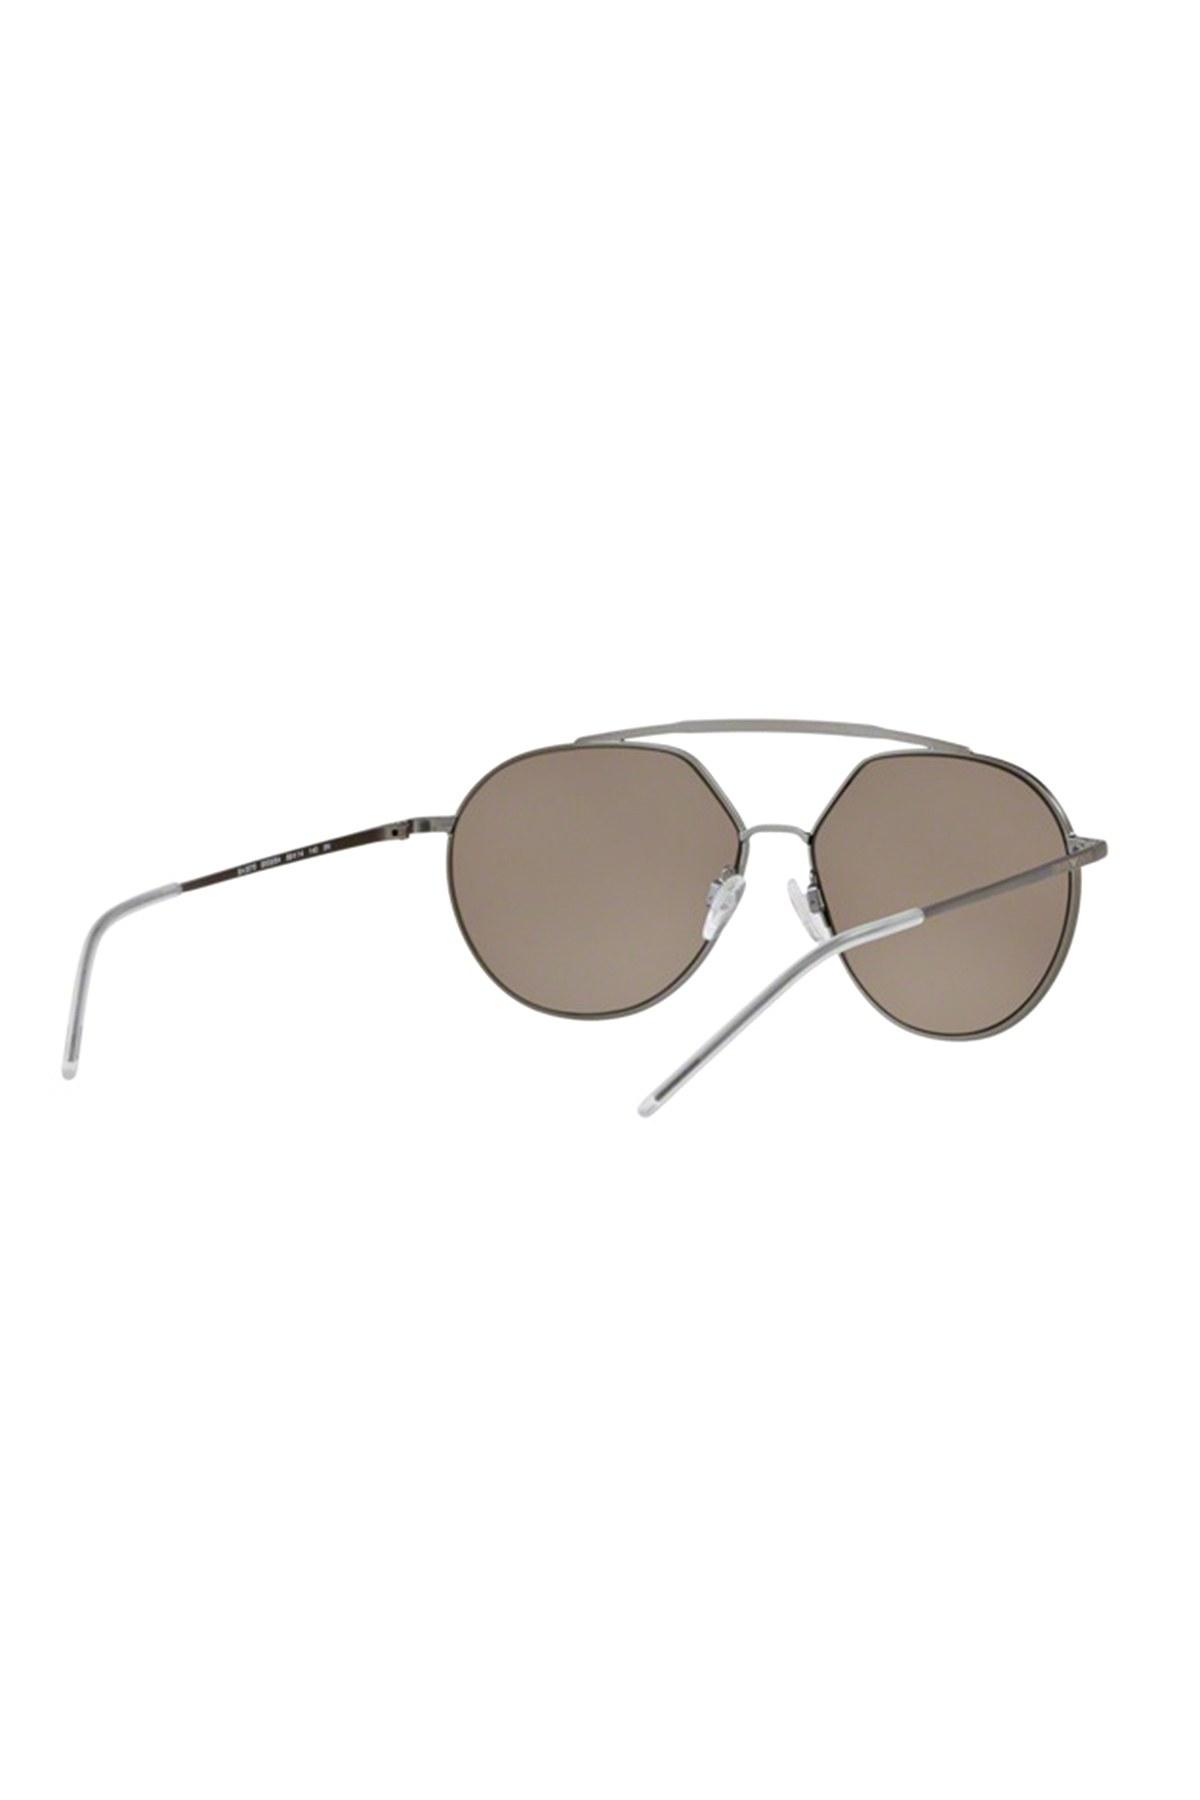 Emporio Armani Erkek Gözlük 0EA2070 30035A 59 KOYU GRİ